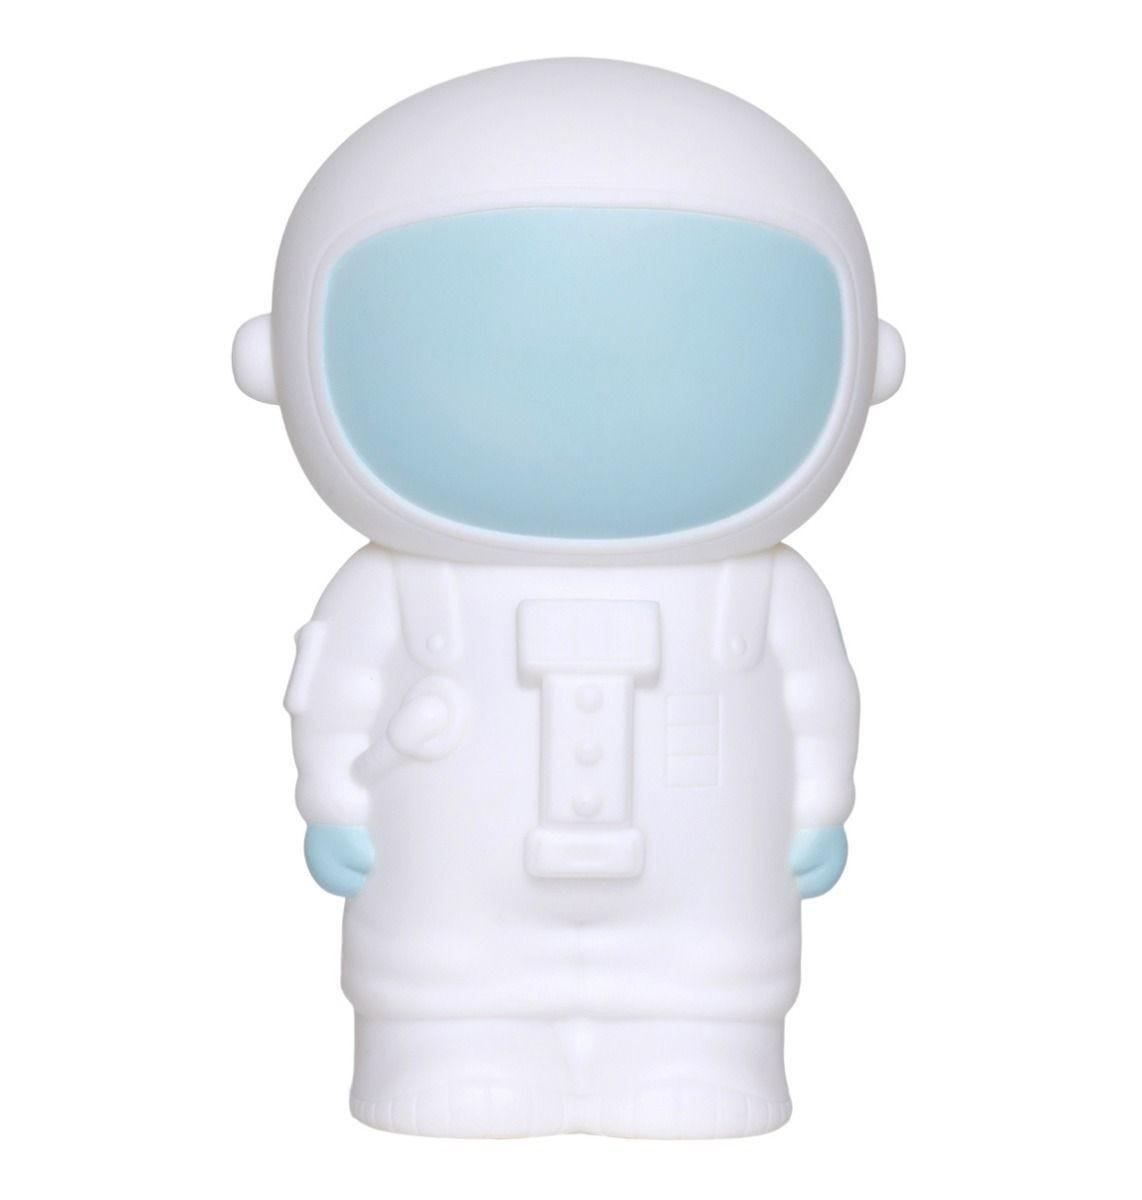 A Little Lovely Company - Money box: Astronaut